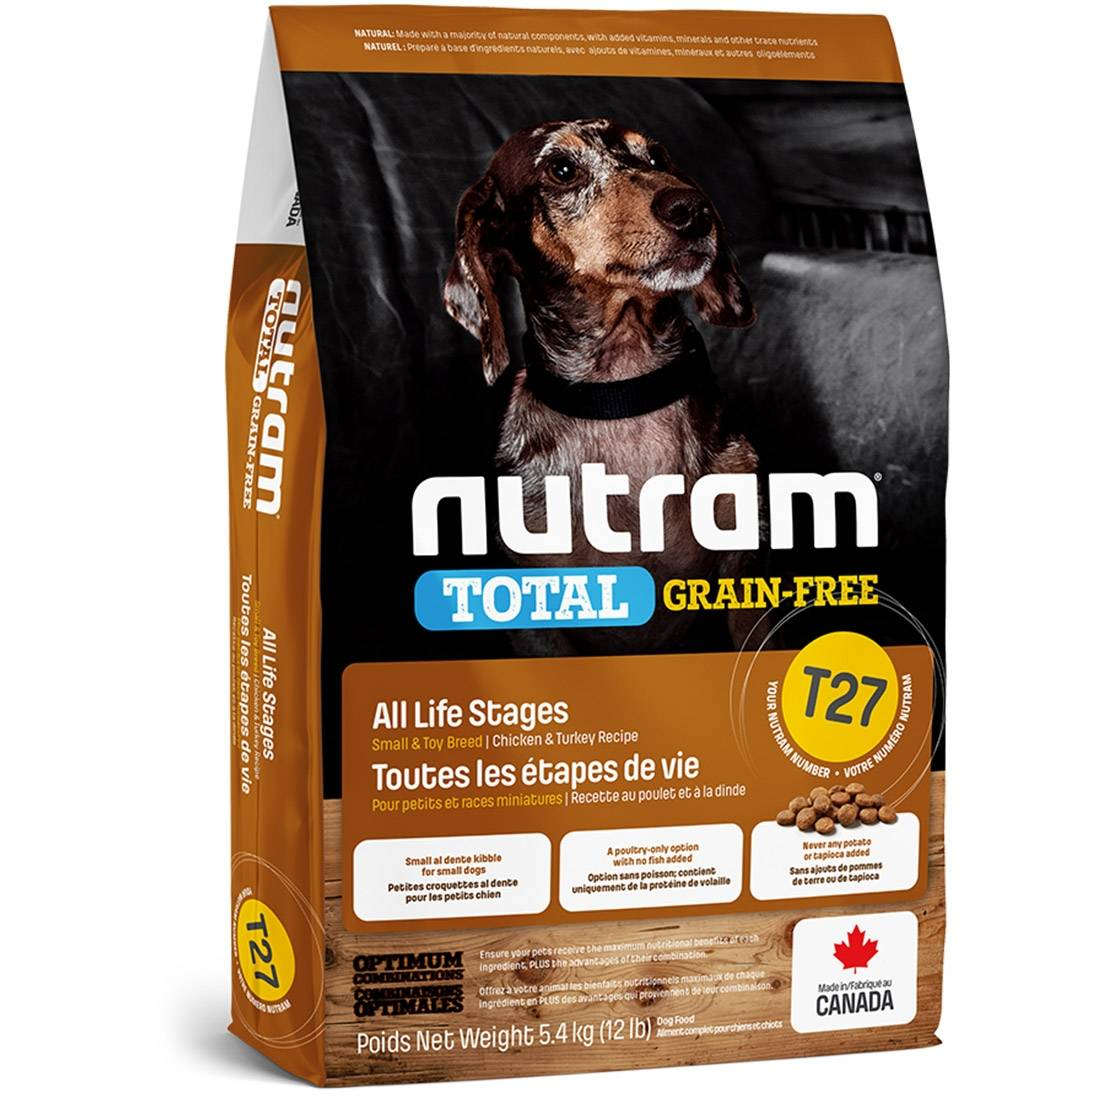 Nutram Croquettes chien Nutram Total Grain-Free T27 Small et Toy Breed Turkey, Chicken & Duck Contenance : 5,4 kg